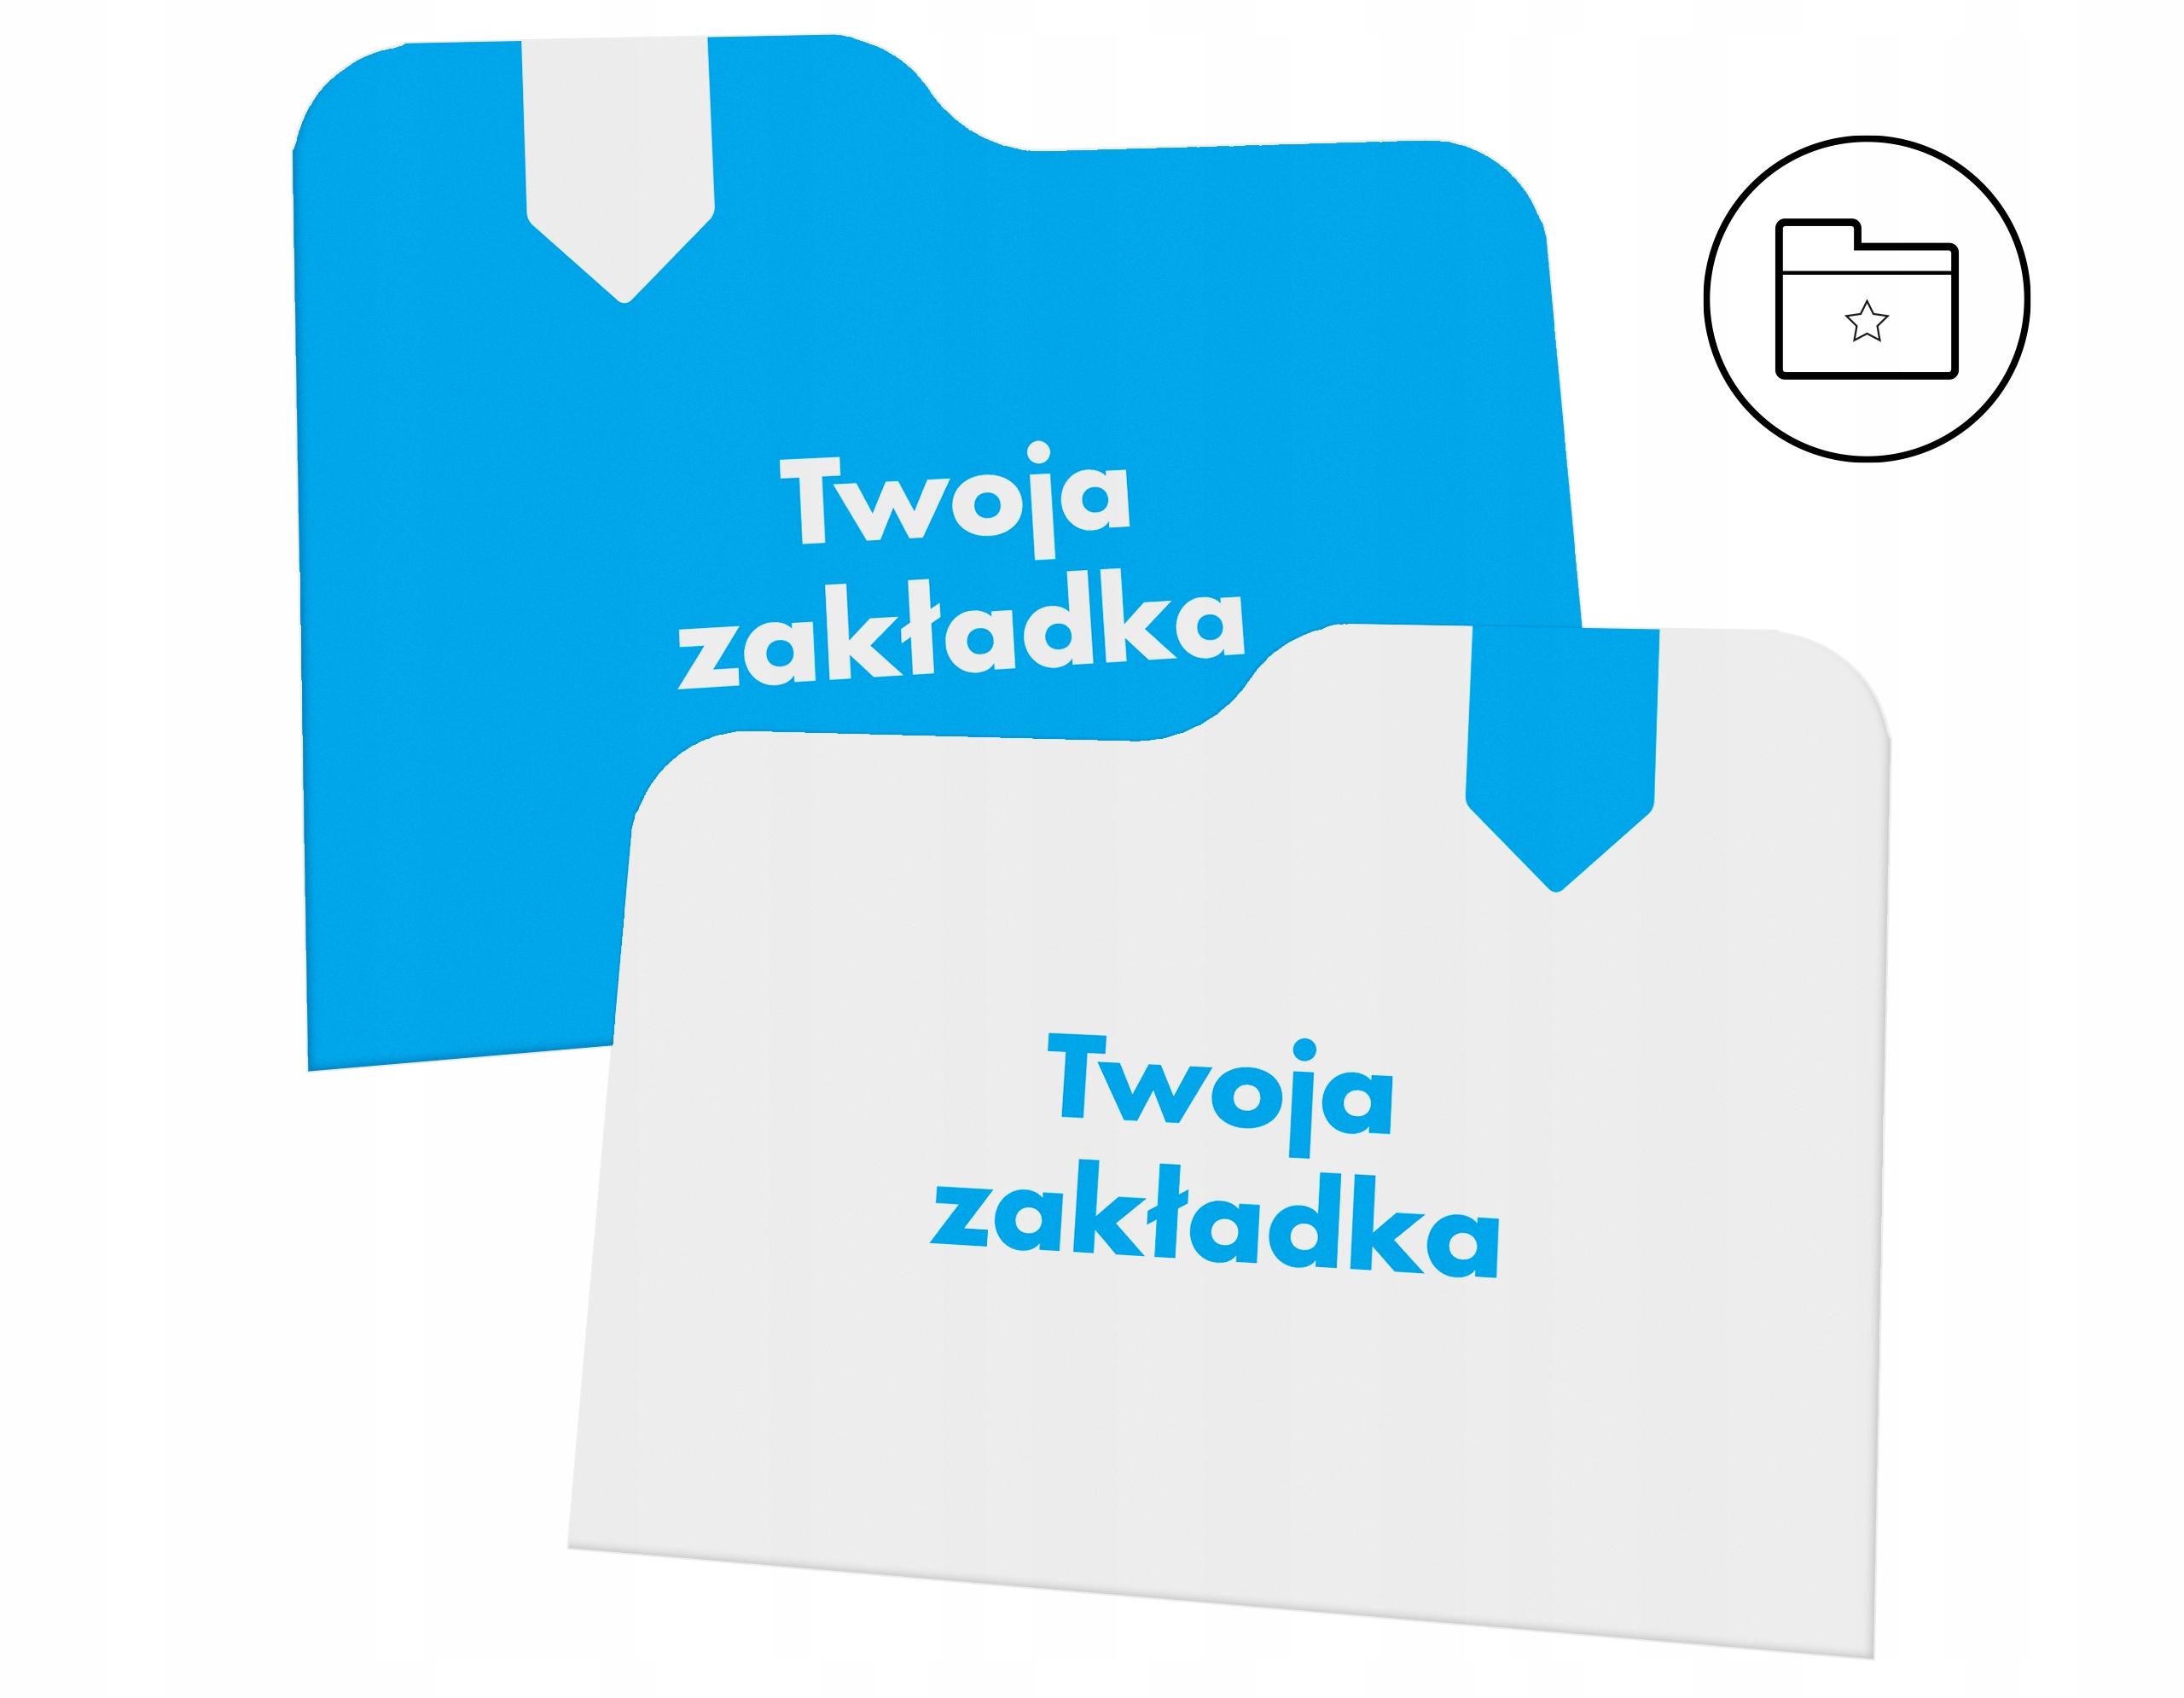 КАРТОЧКИ - английский язык - Глаголы frazowe (A1-B2)